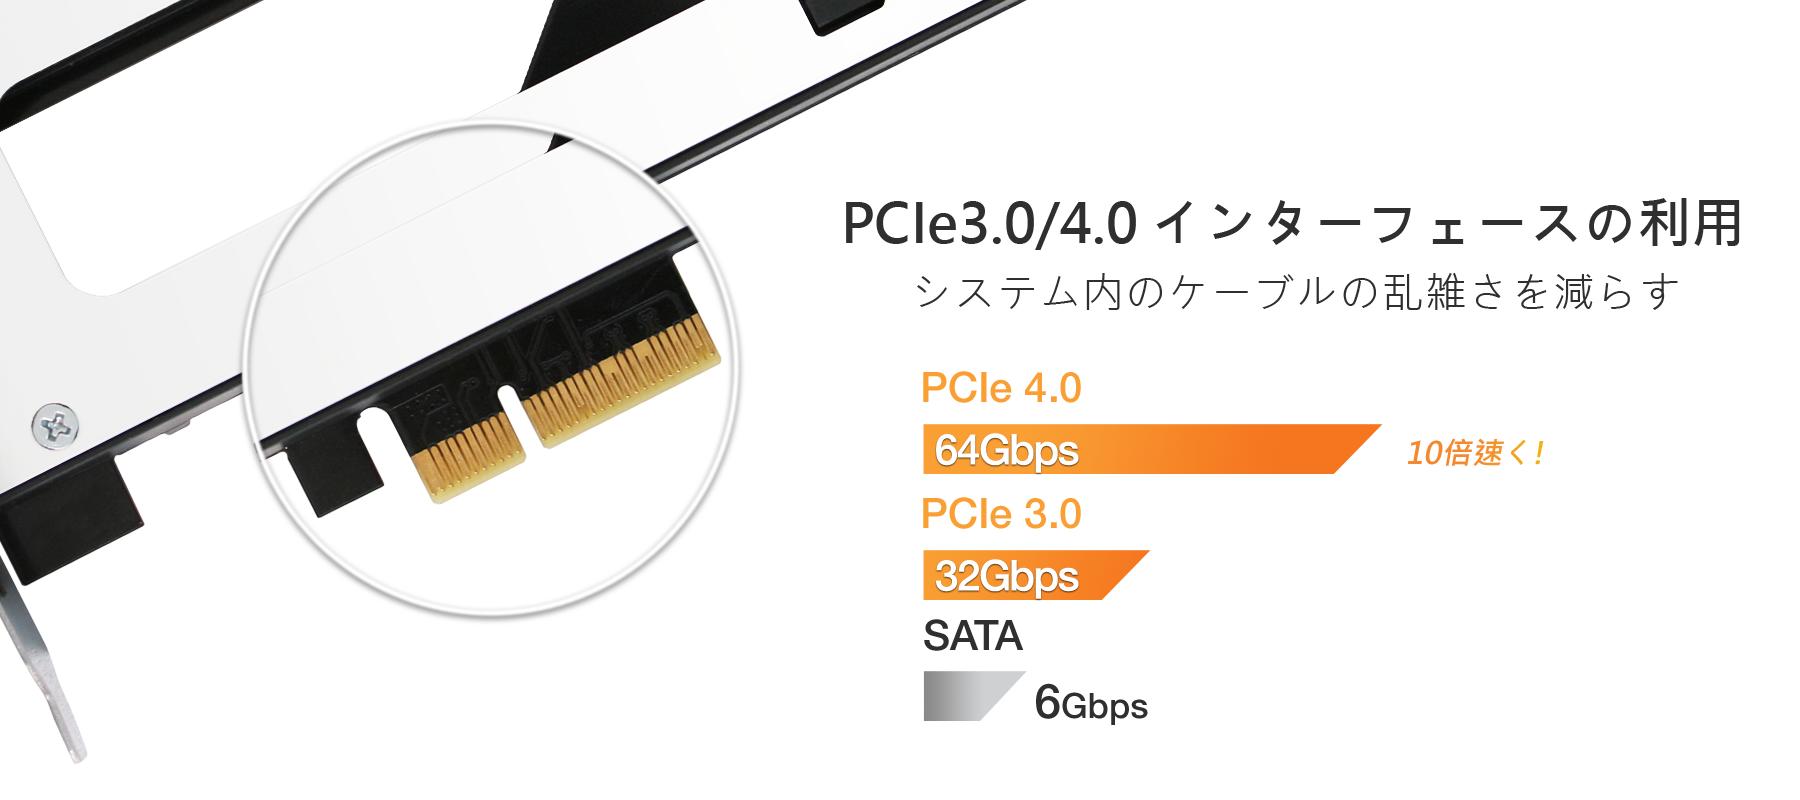 mb840m2p-b PCIe 3.0インターフェースを利用すると